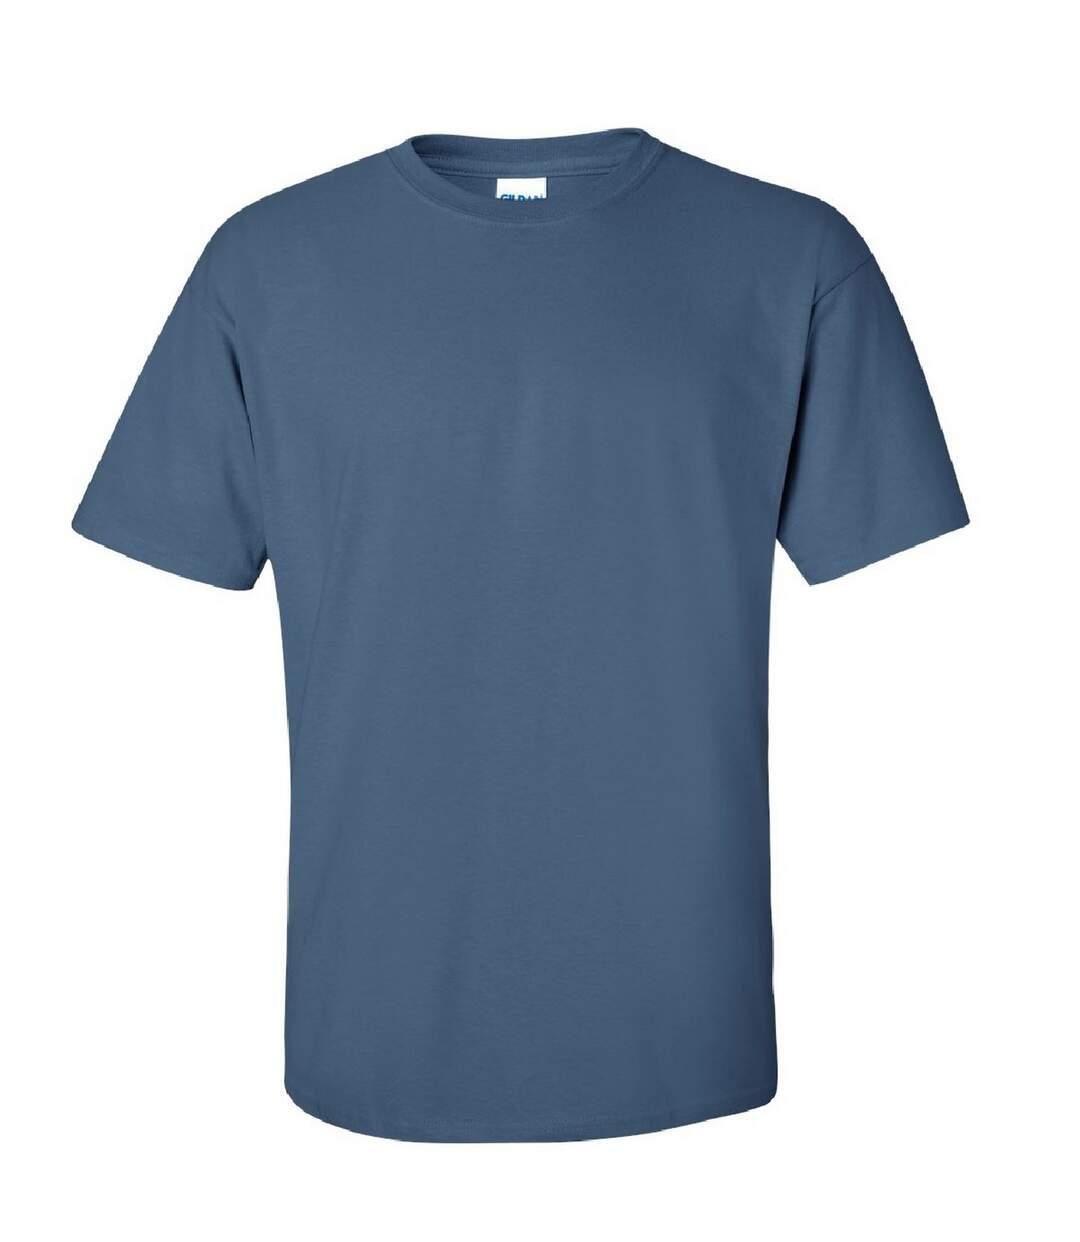 Gildan Mens Ultra Cotton Short Sleeve T-Shirt (Indigo Blue) - UTBC475